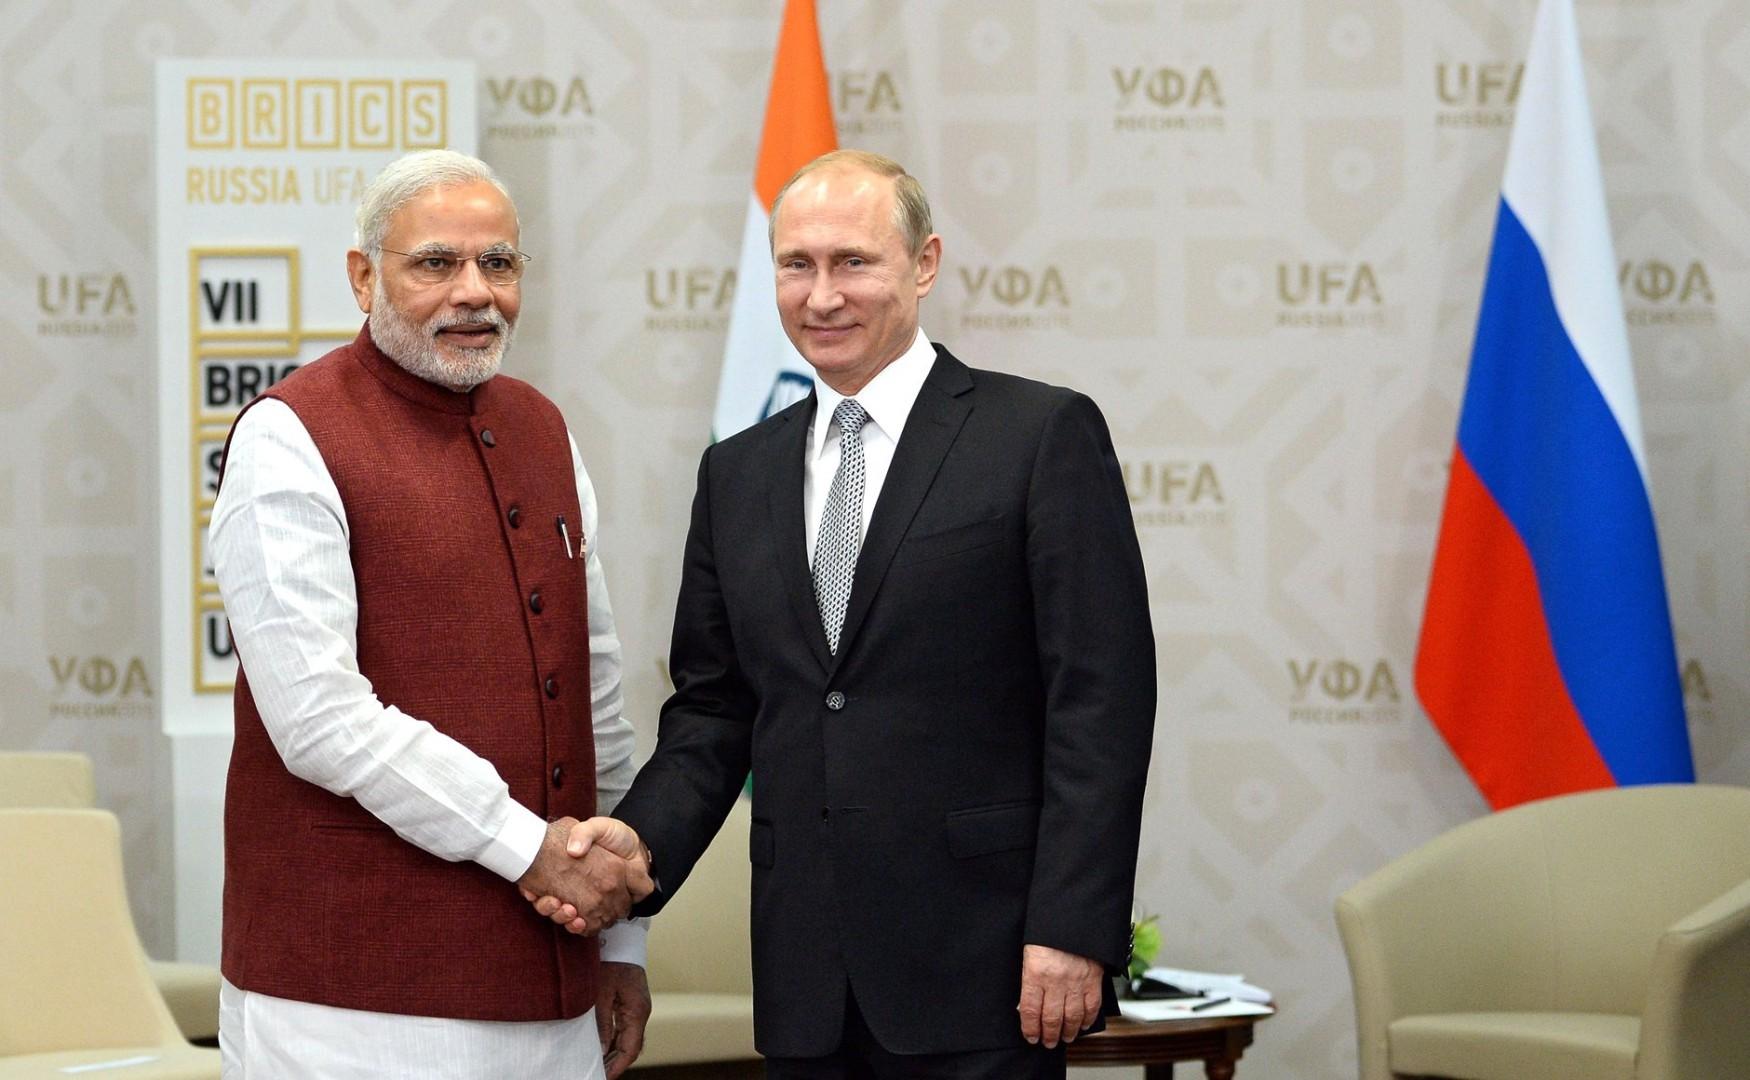 Vladimir Putin e Narendra Modi al vertice BRICS 2015 (fonte Wikipedia)